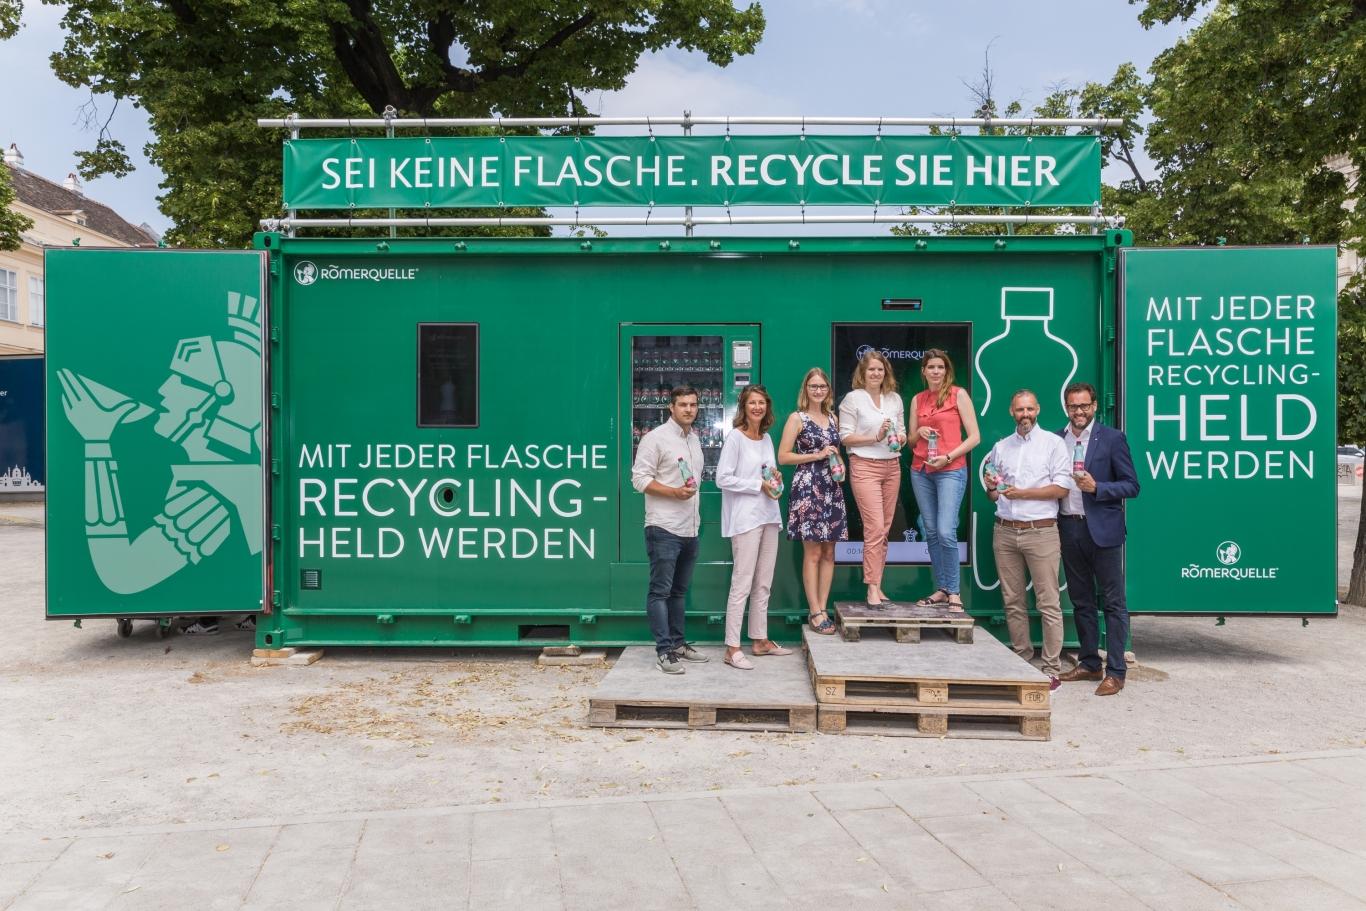 Römerquelle Recycling